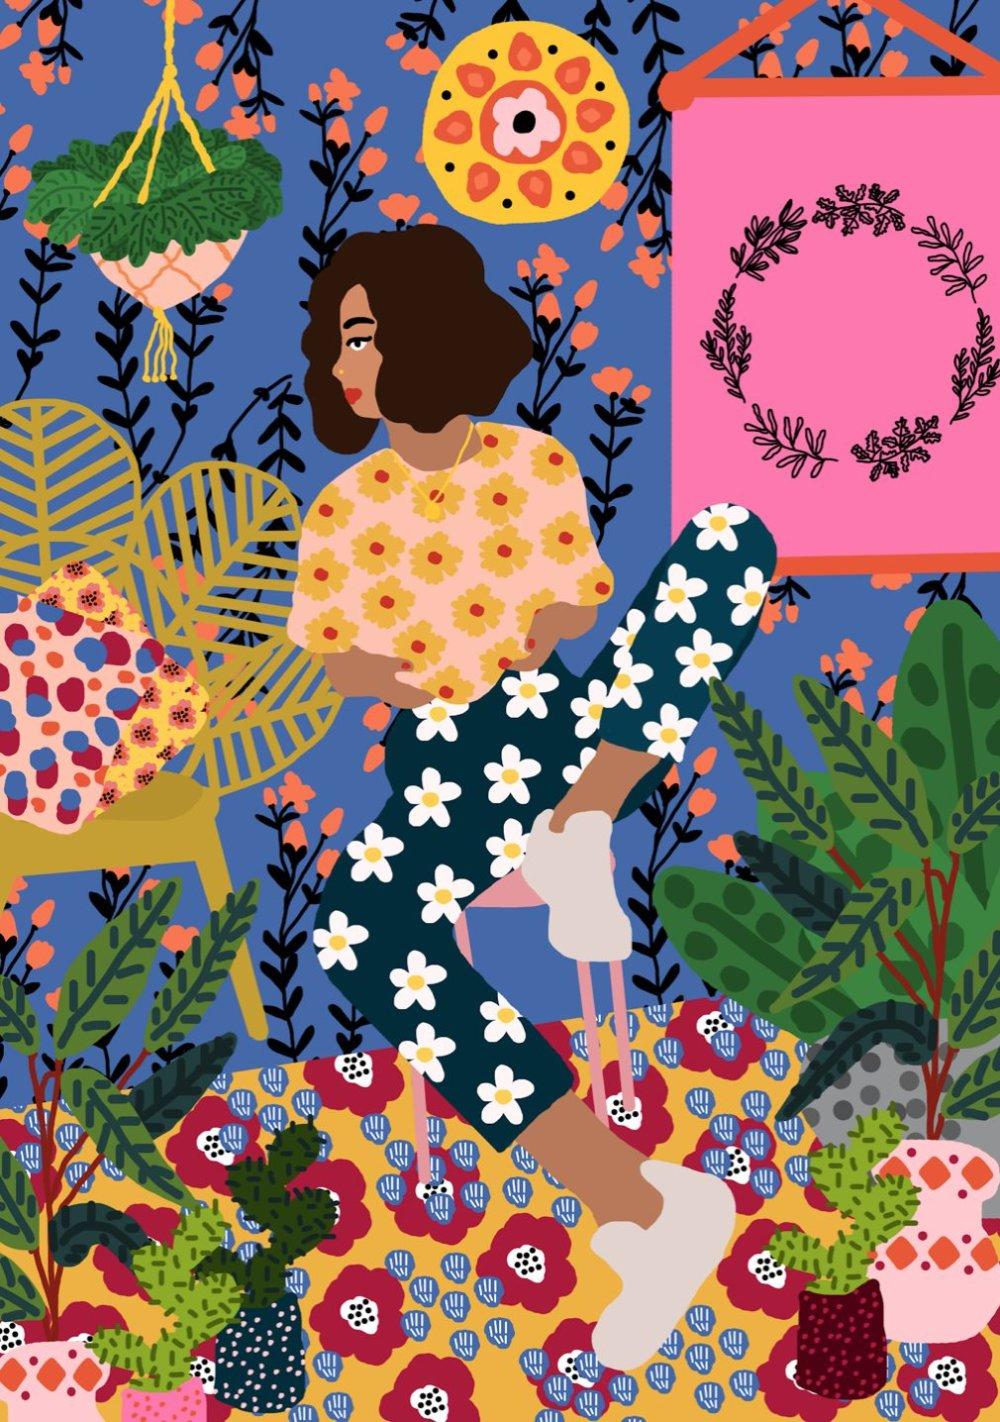 Gorgeous And Colorful Floral Illustrations By Rafaela Mascaro 4